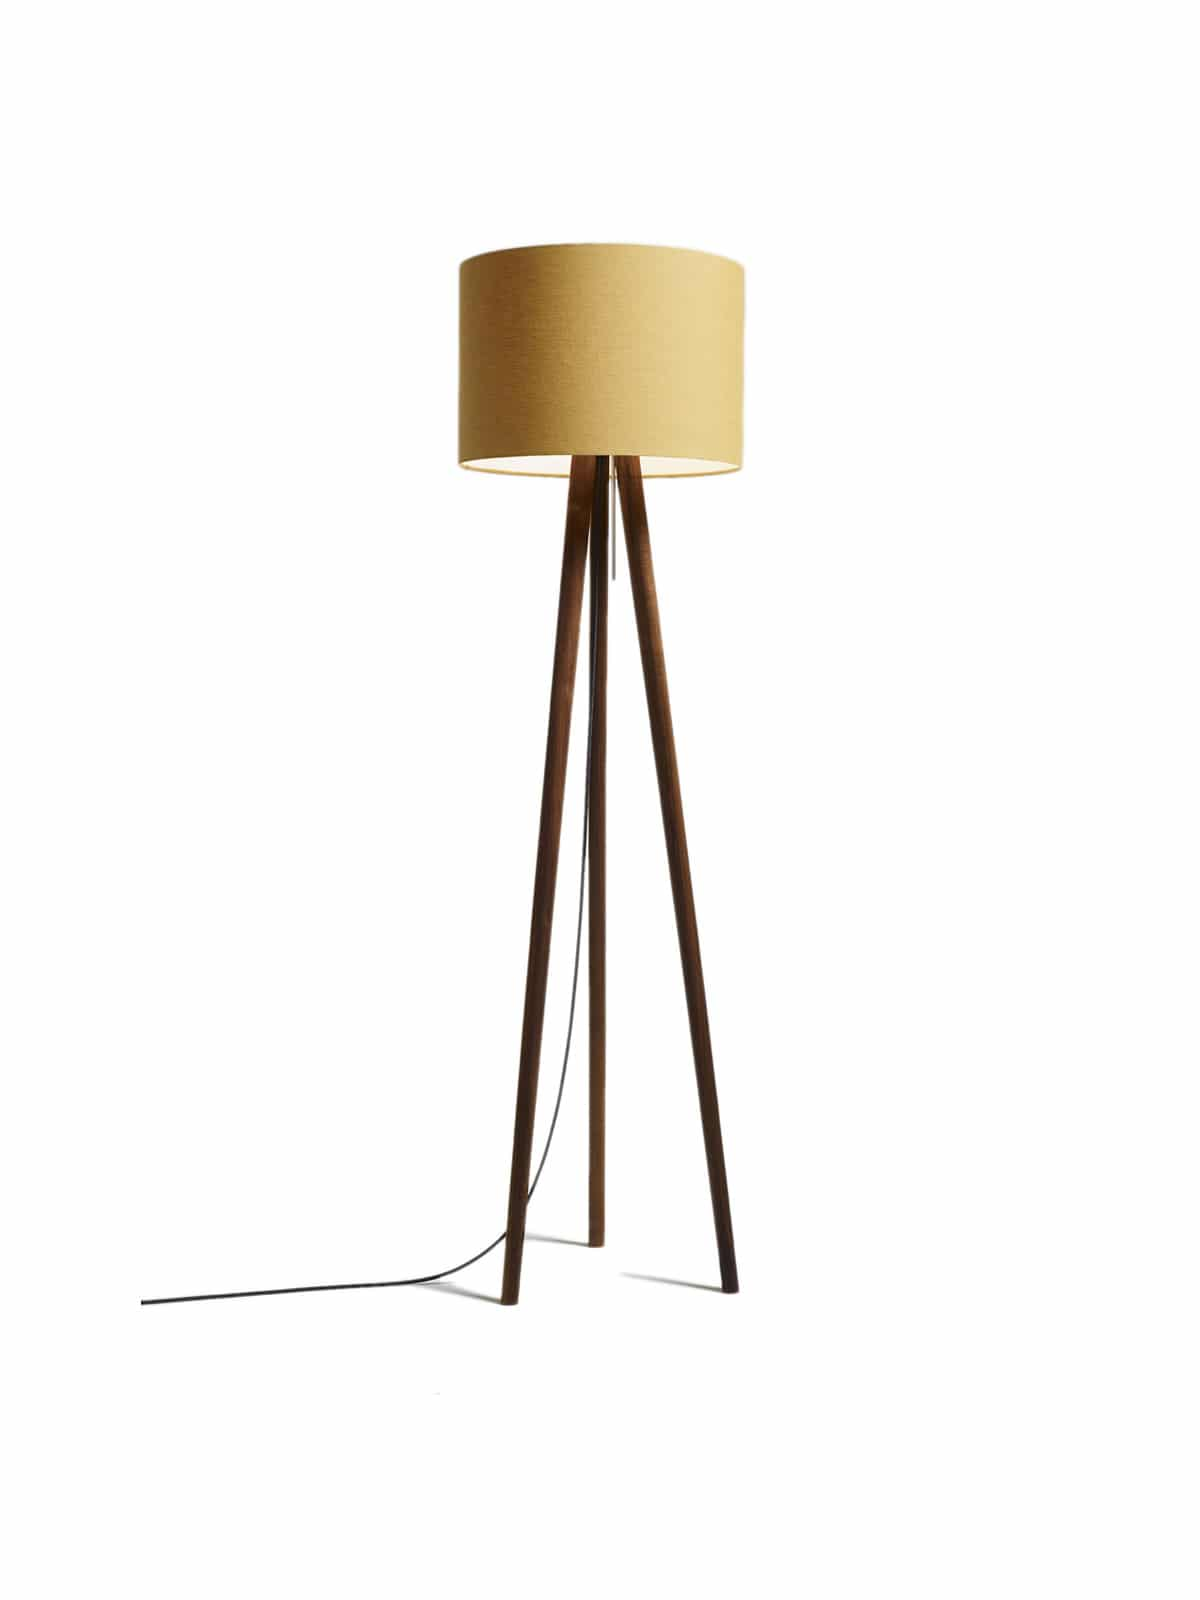 STEN Linum - Lampen Leuchten Designerleuchten Online Berlin Design